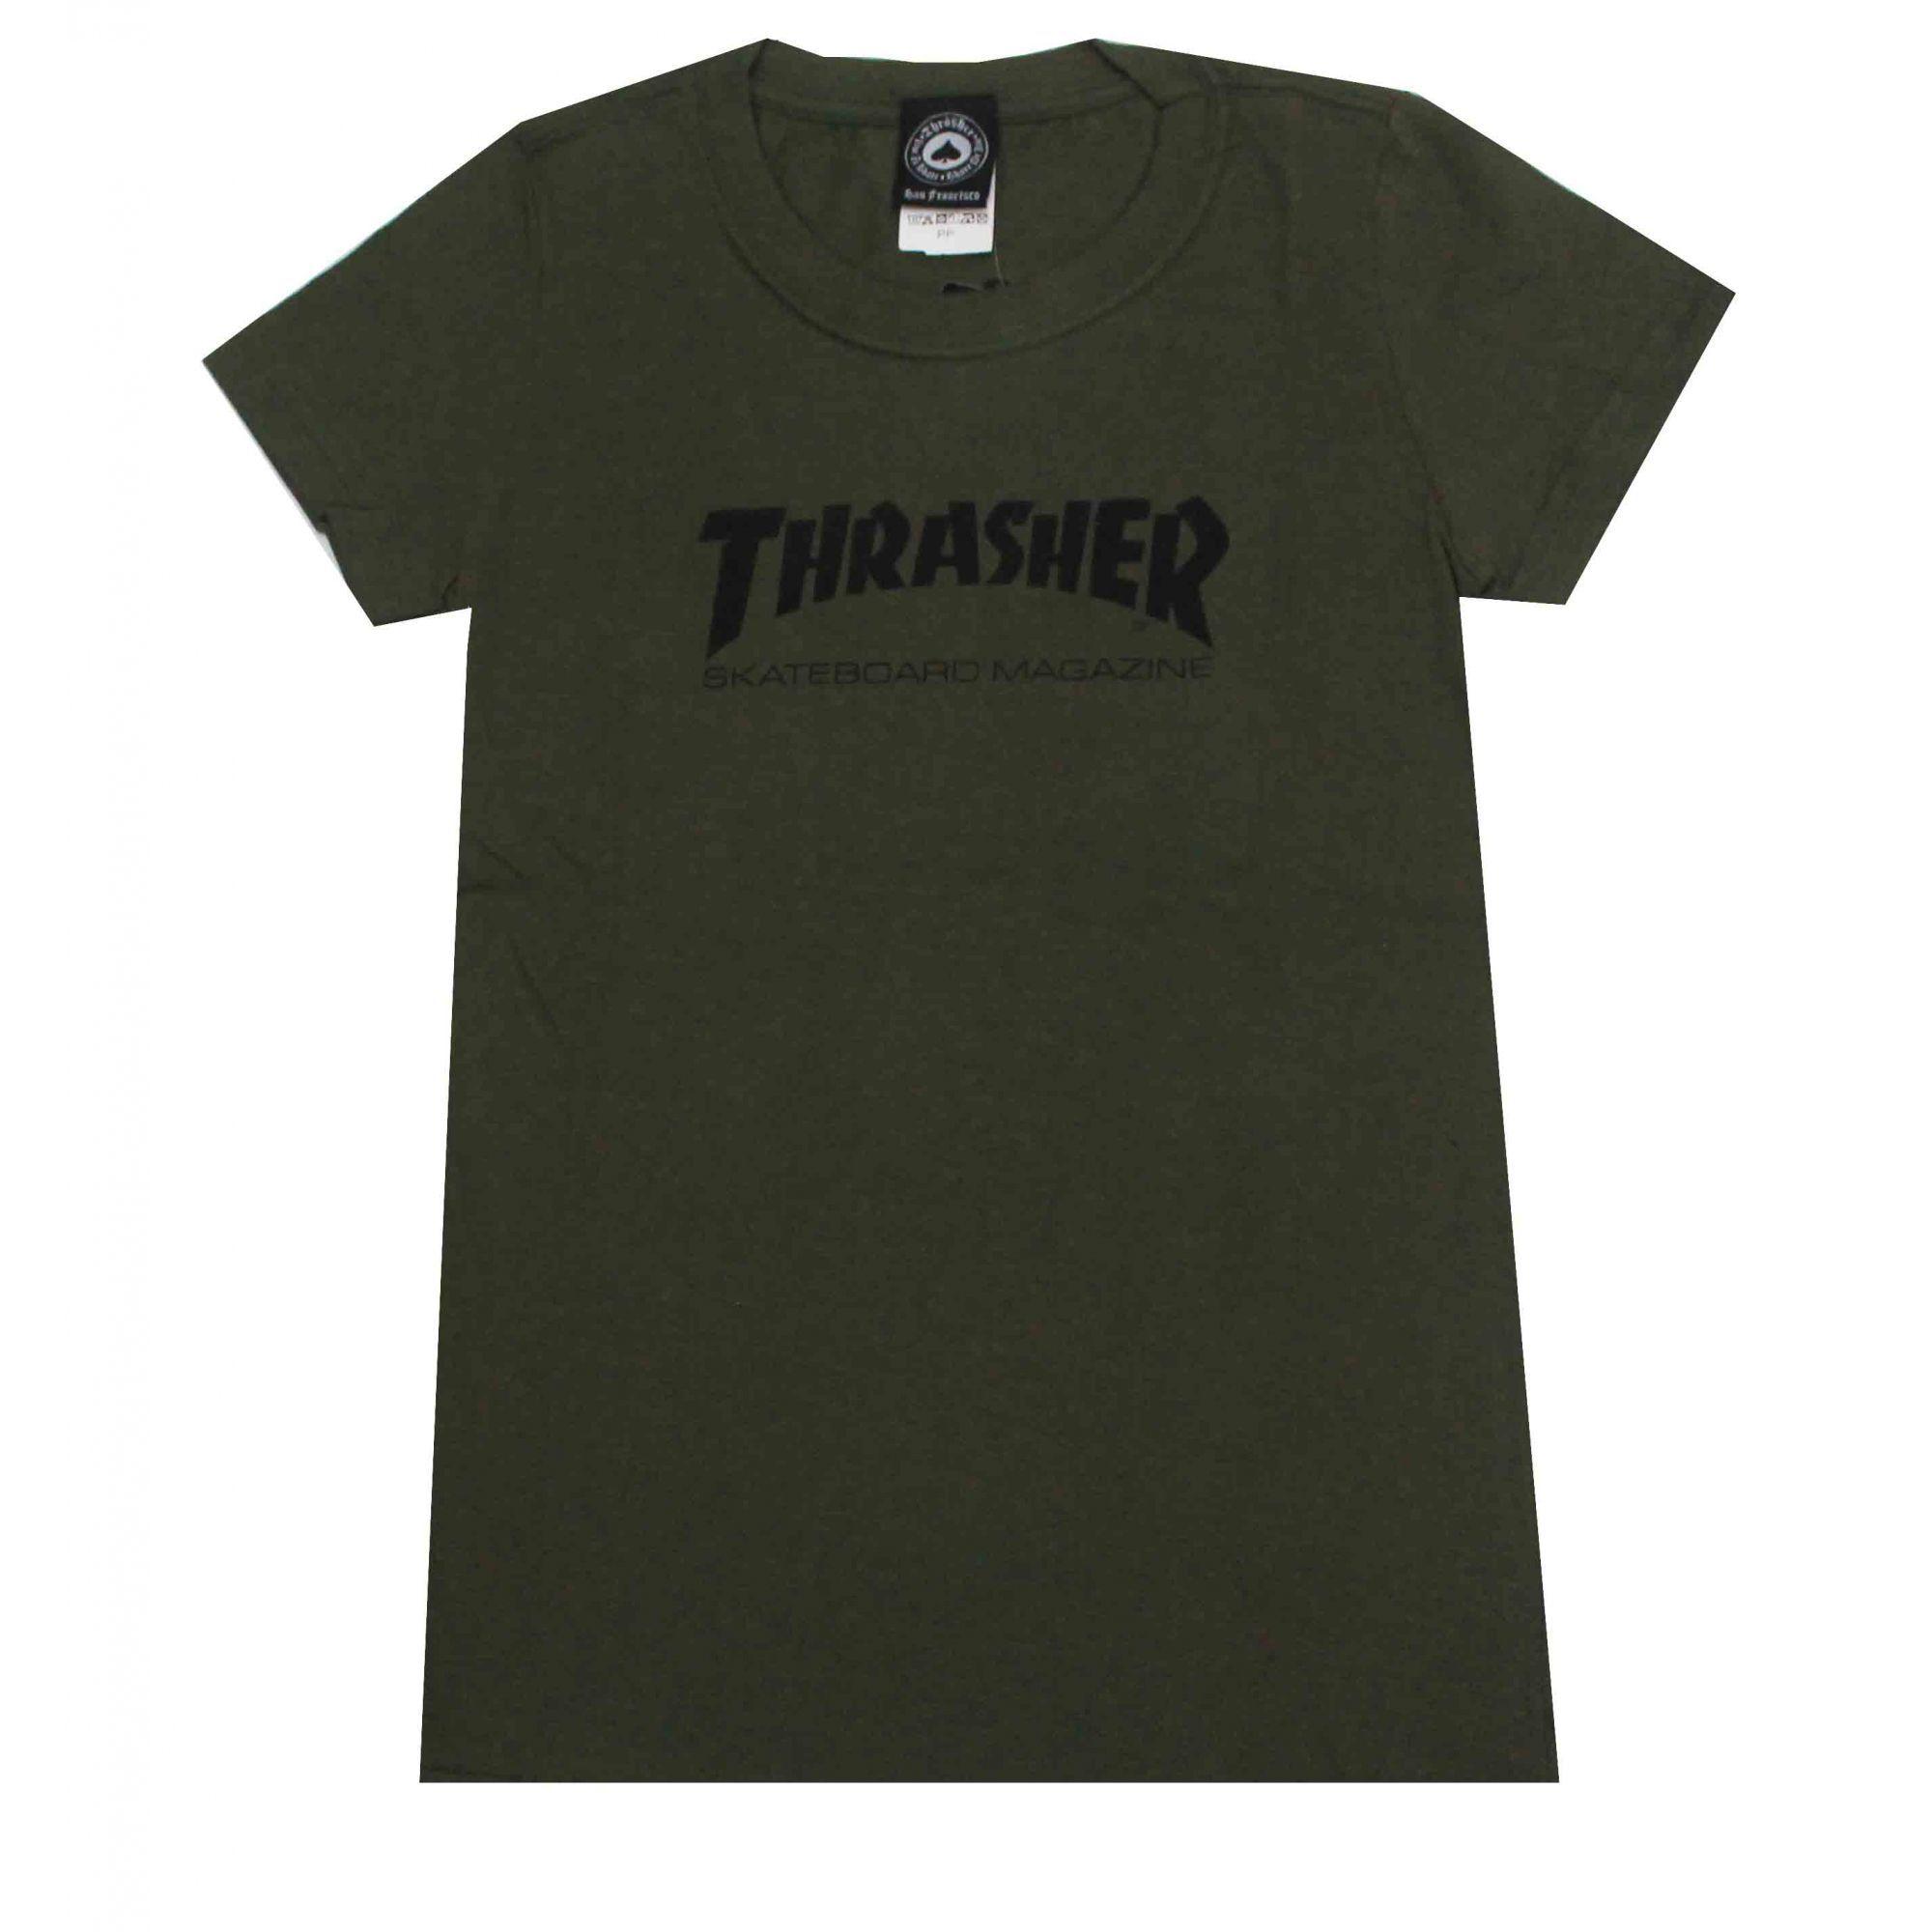 Camiseta Feminina Thrasher Magazine Skate Mag Military Green